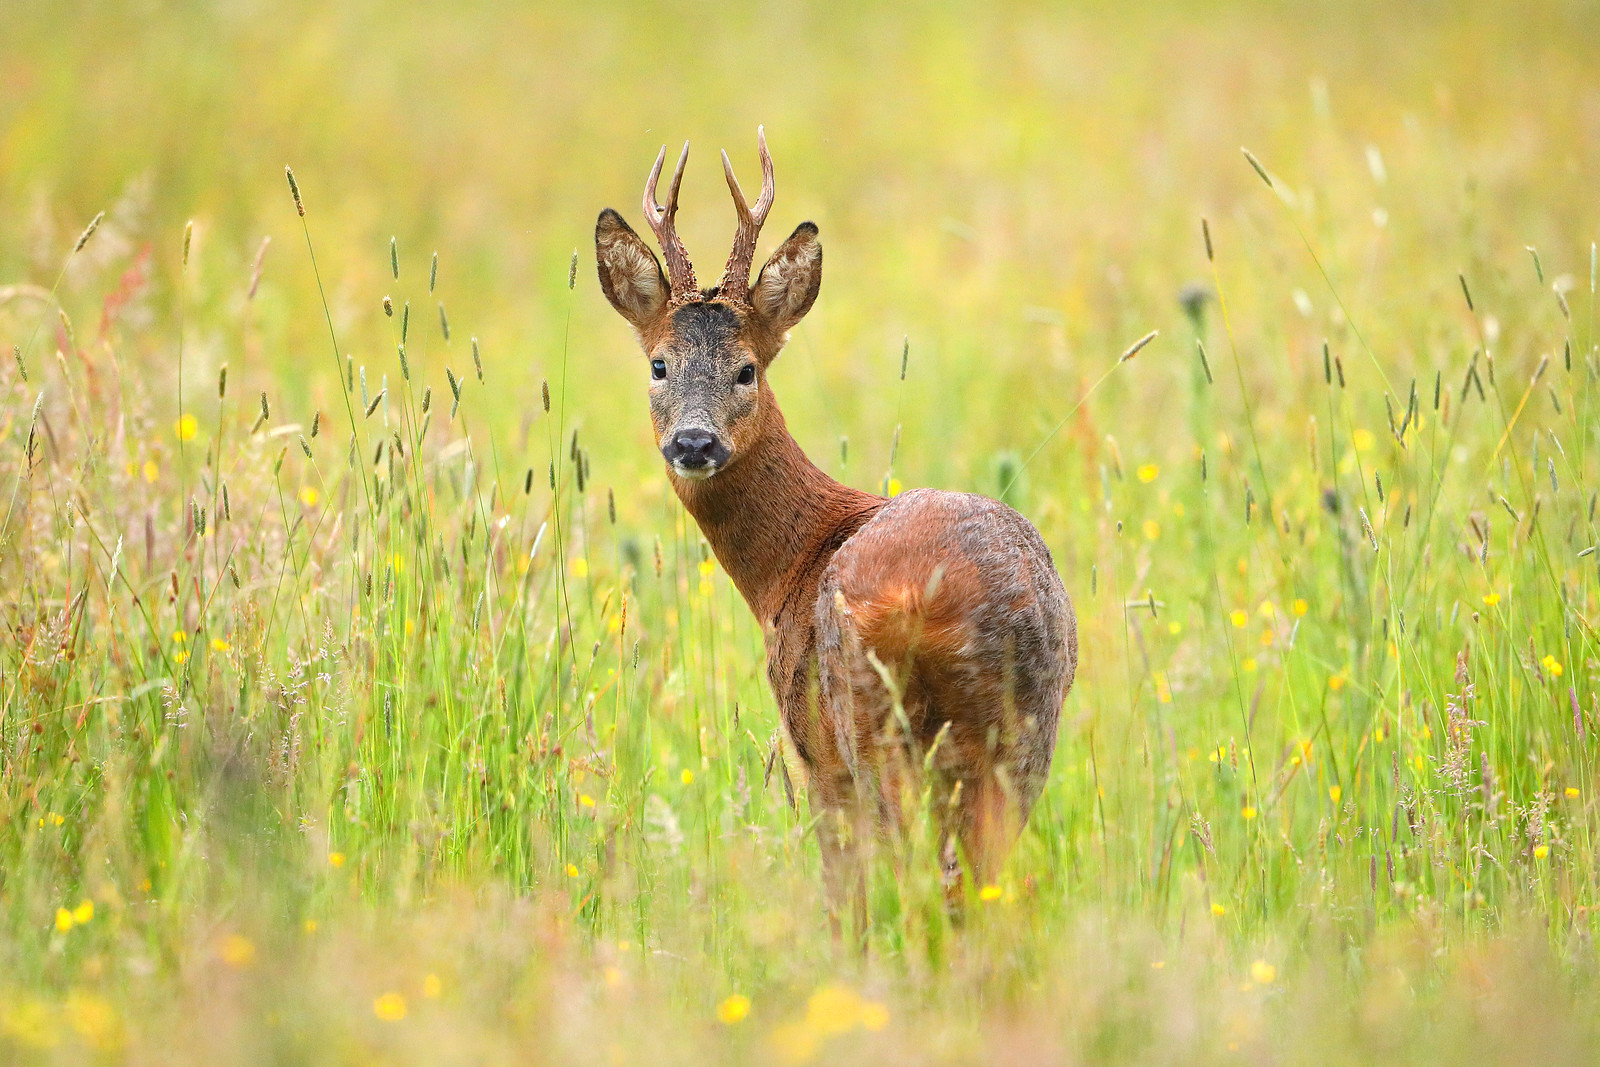 Mature Roe Buck in Summer Meadow